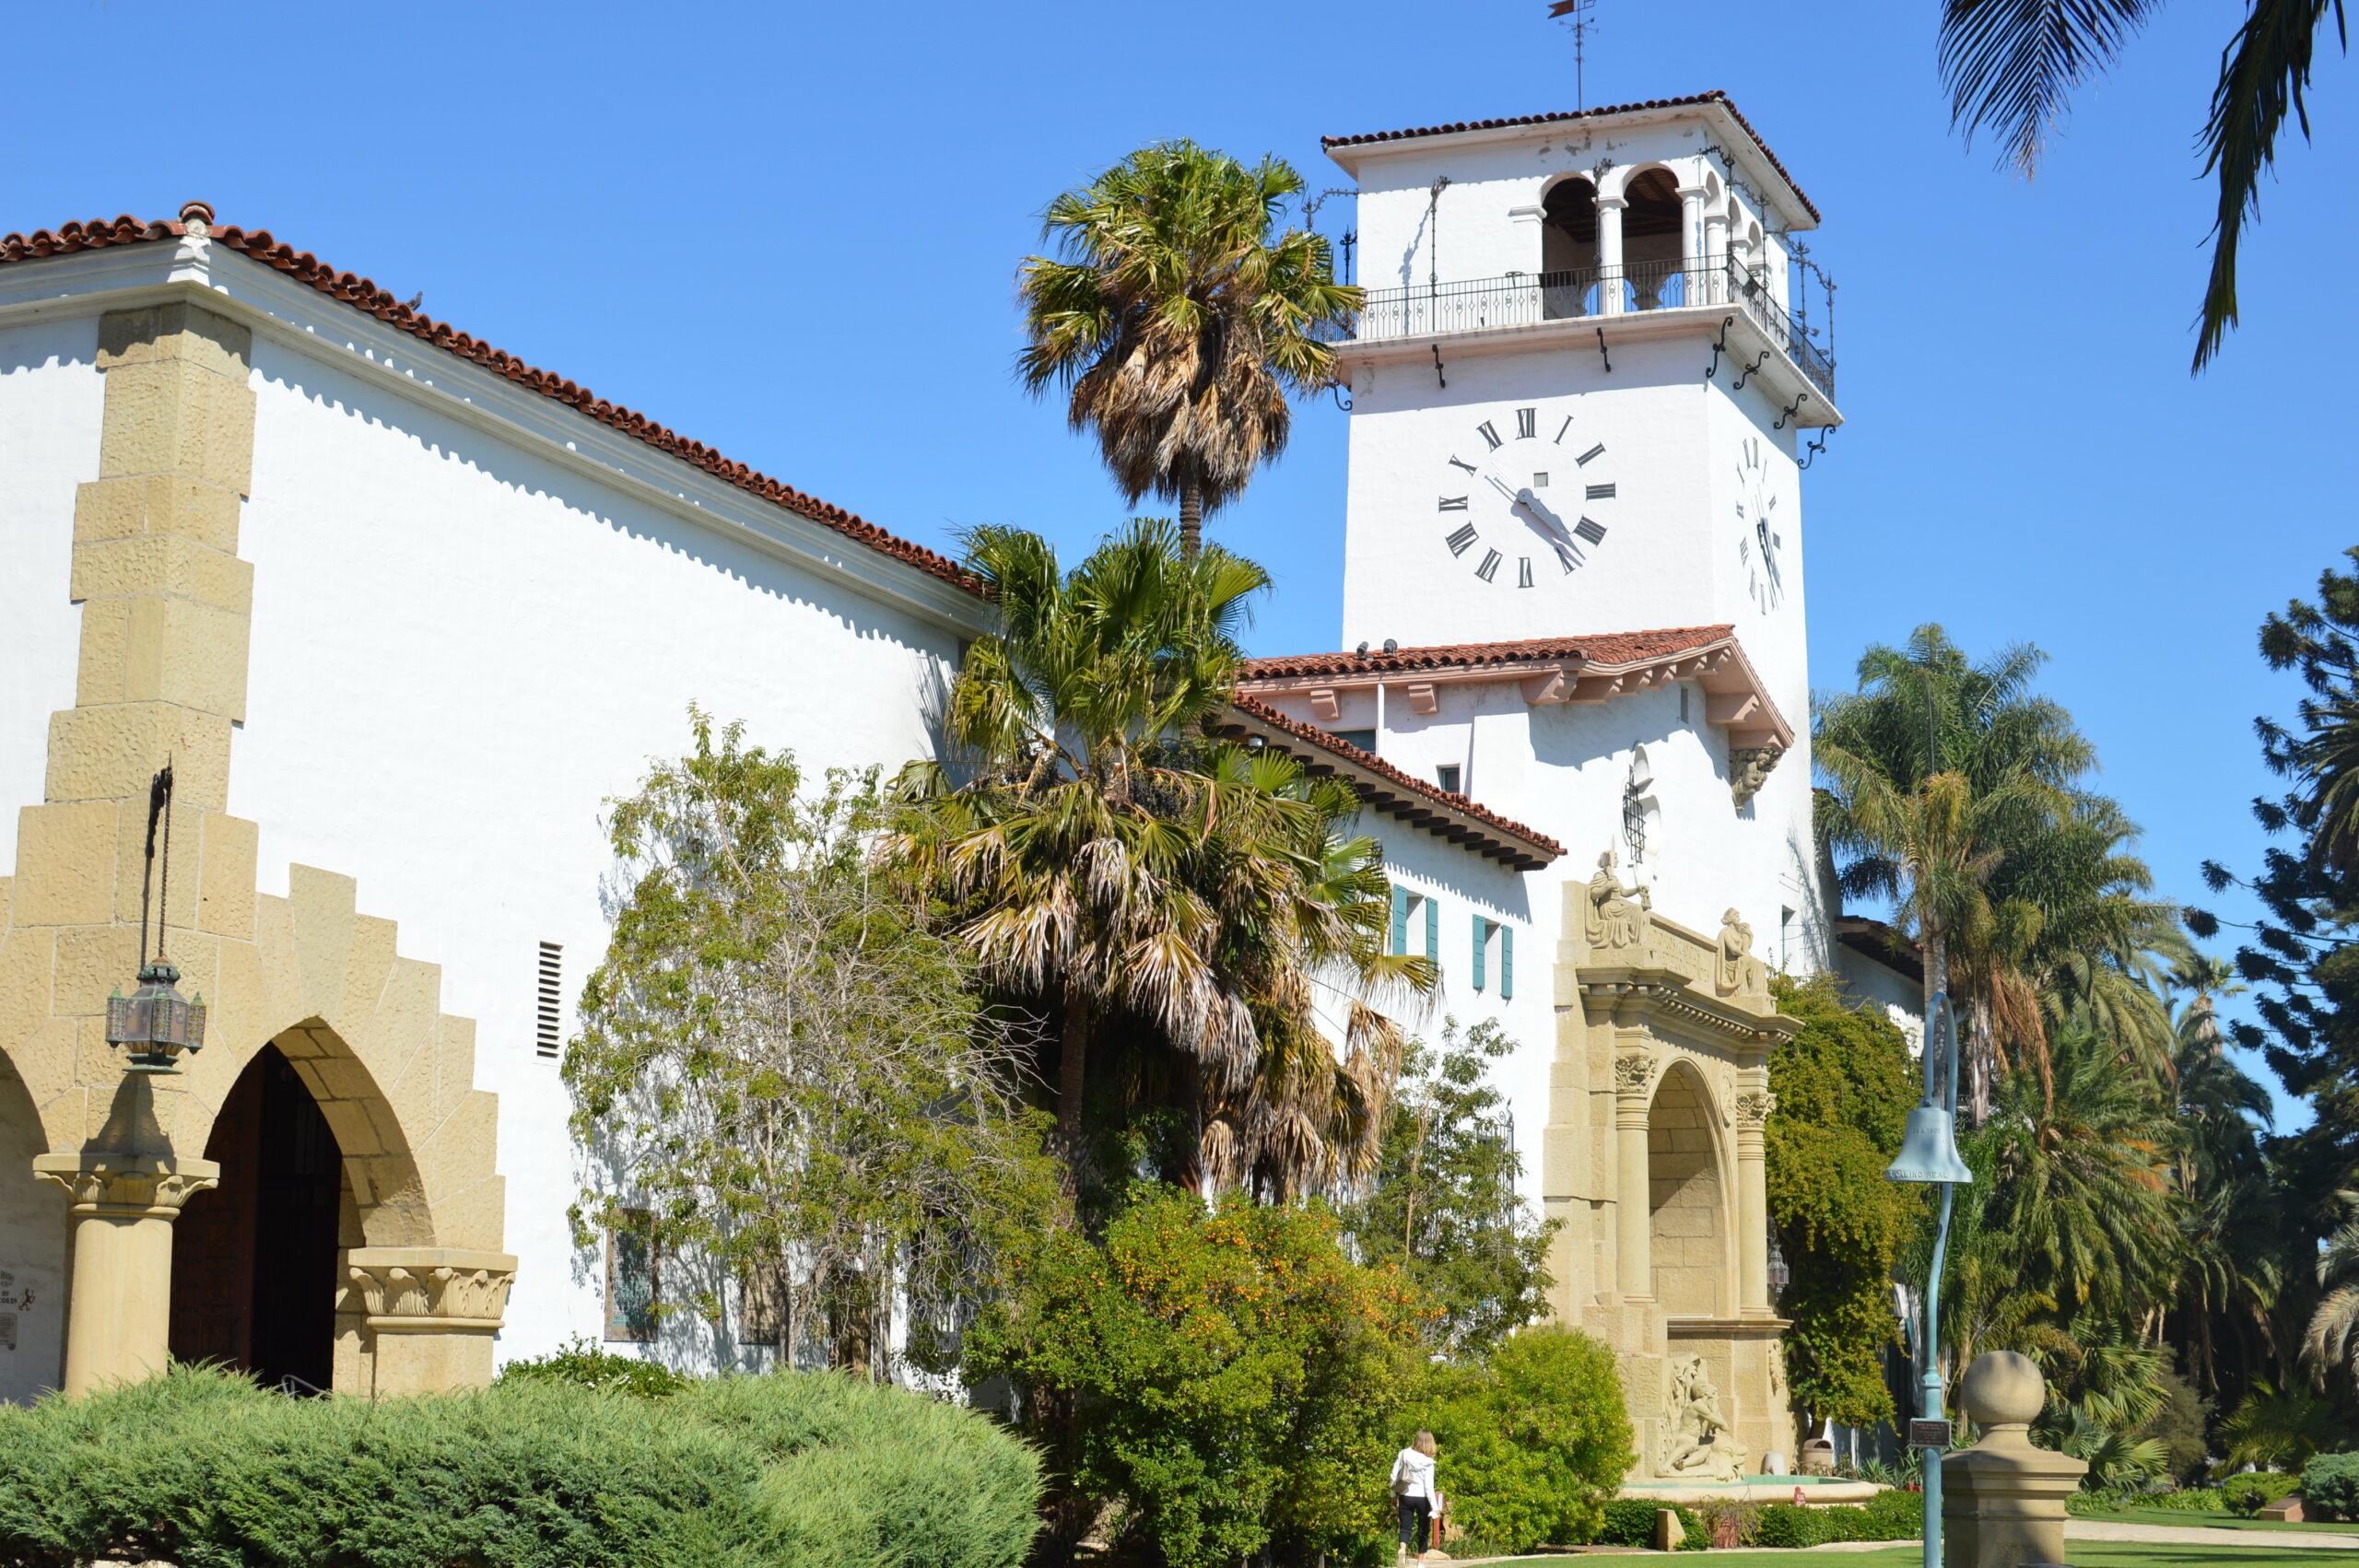 Santa Barbara County Courthouse and Clock Tower